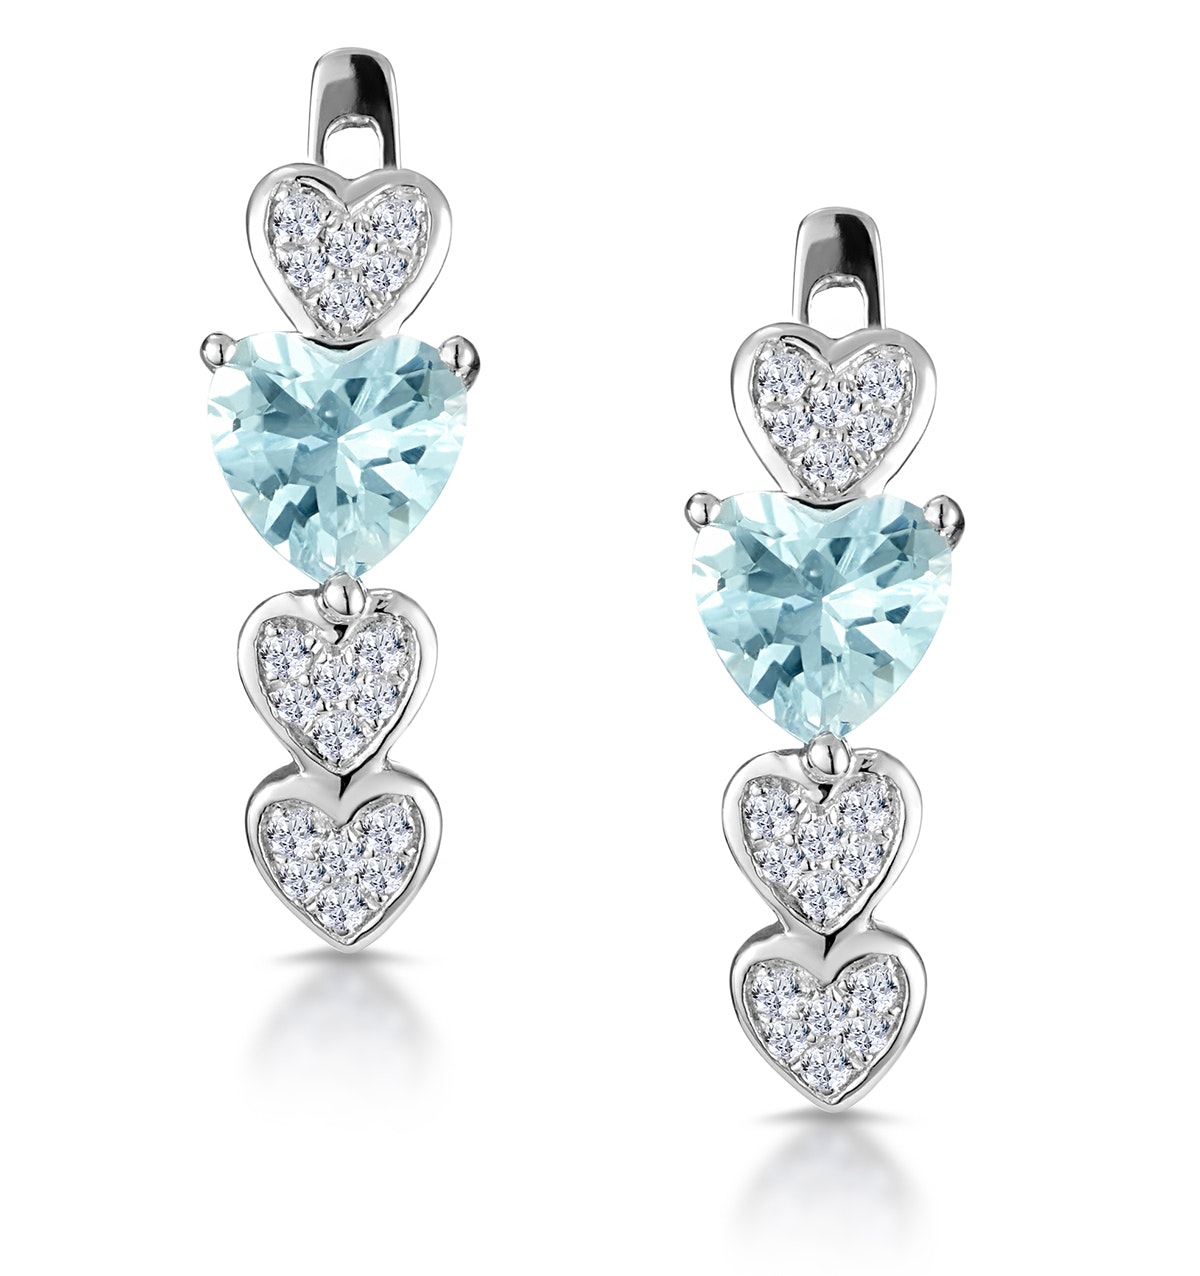 0.60ct Aquamarine and Diamond Heart Stellato Earrings - 9K White Gold